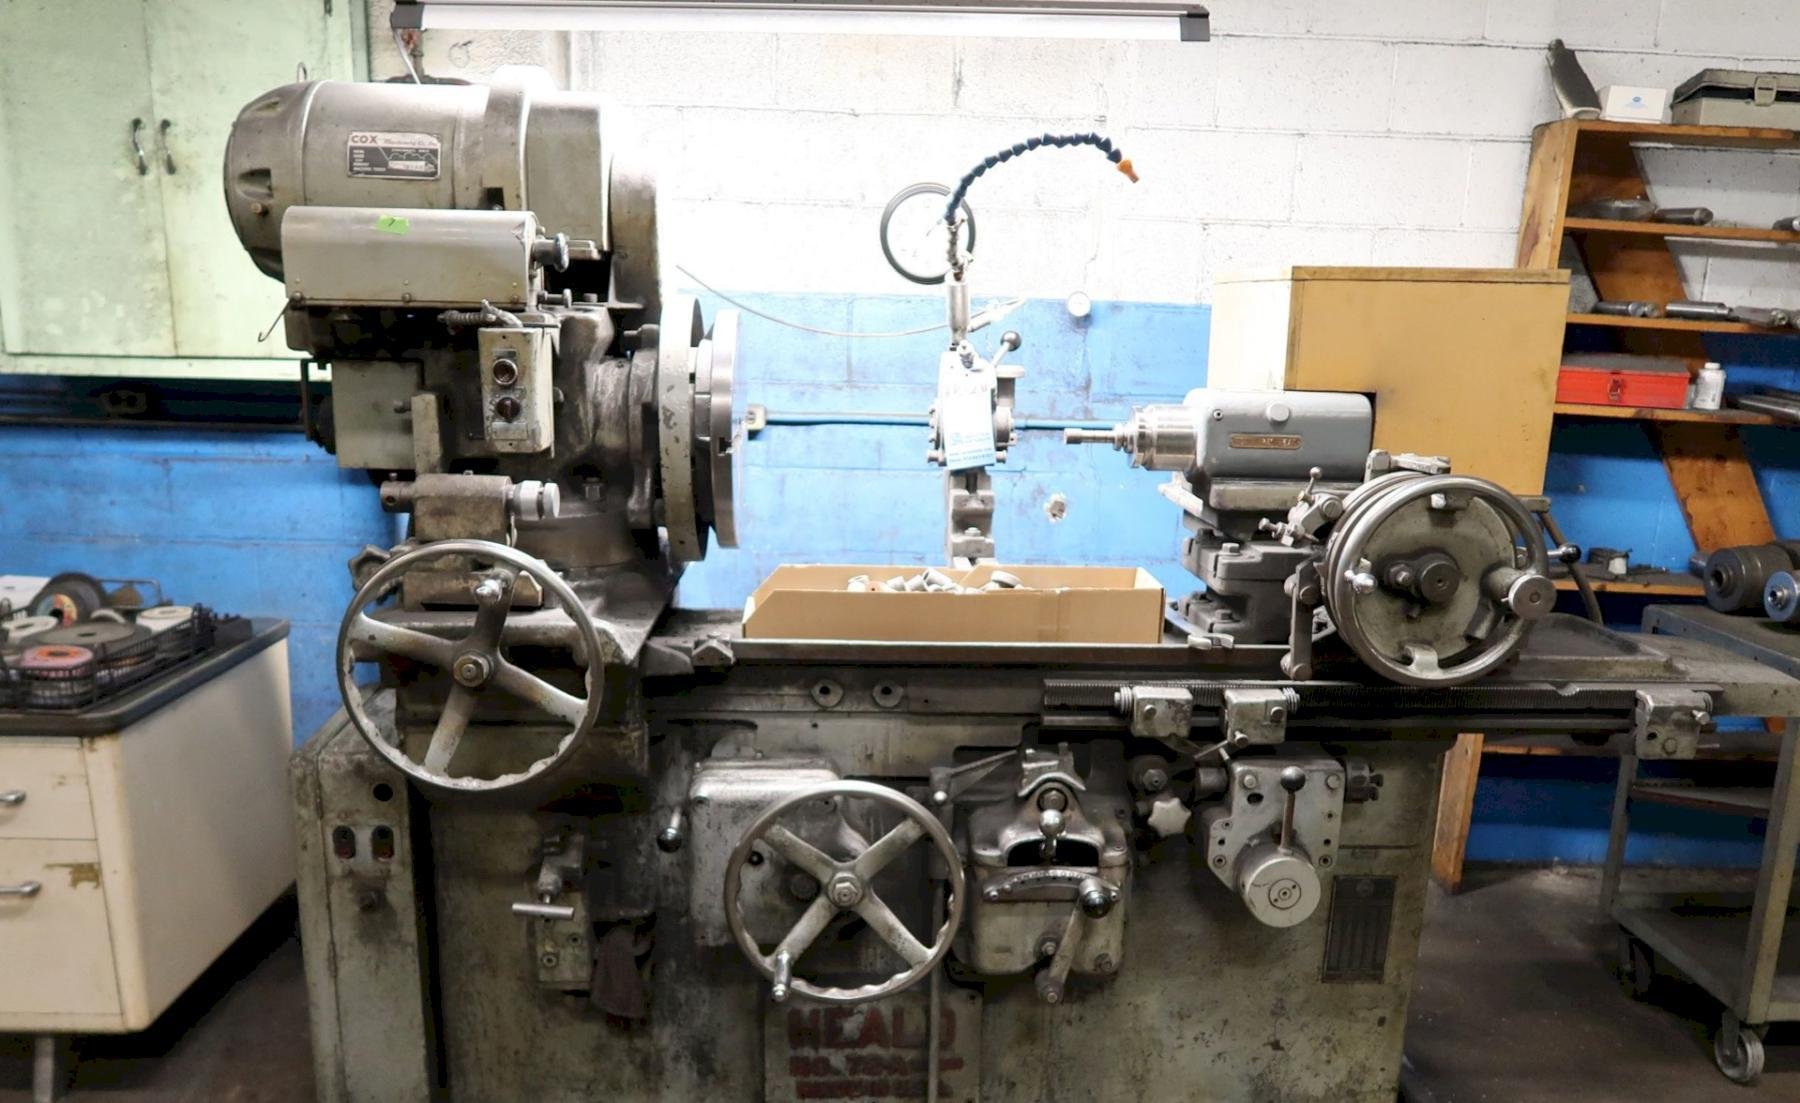 Heald Model 72A Internal Grinding Machine, S/N pending.